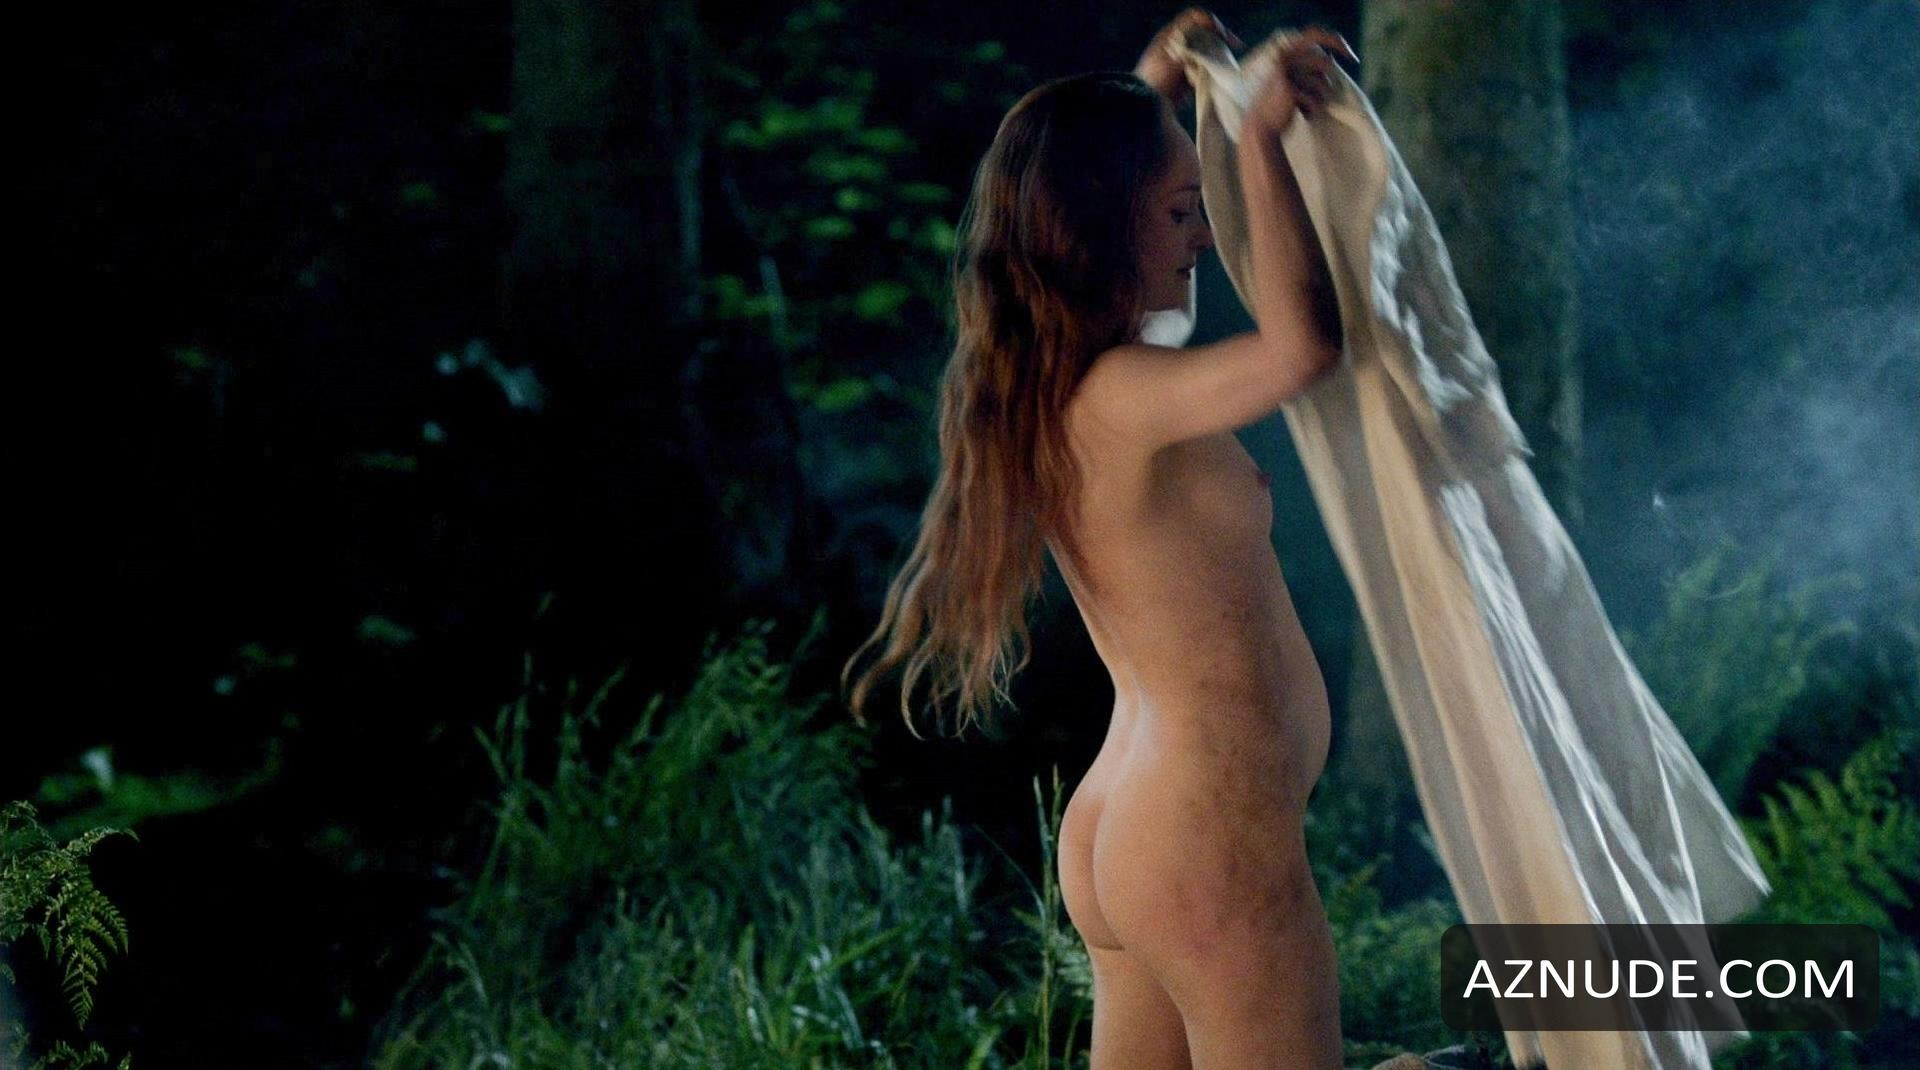 Caitriona balfe and lotte verbeek nude outlander s01e10 4